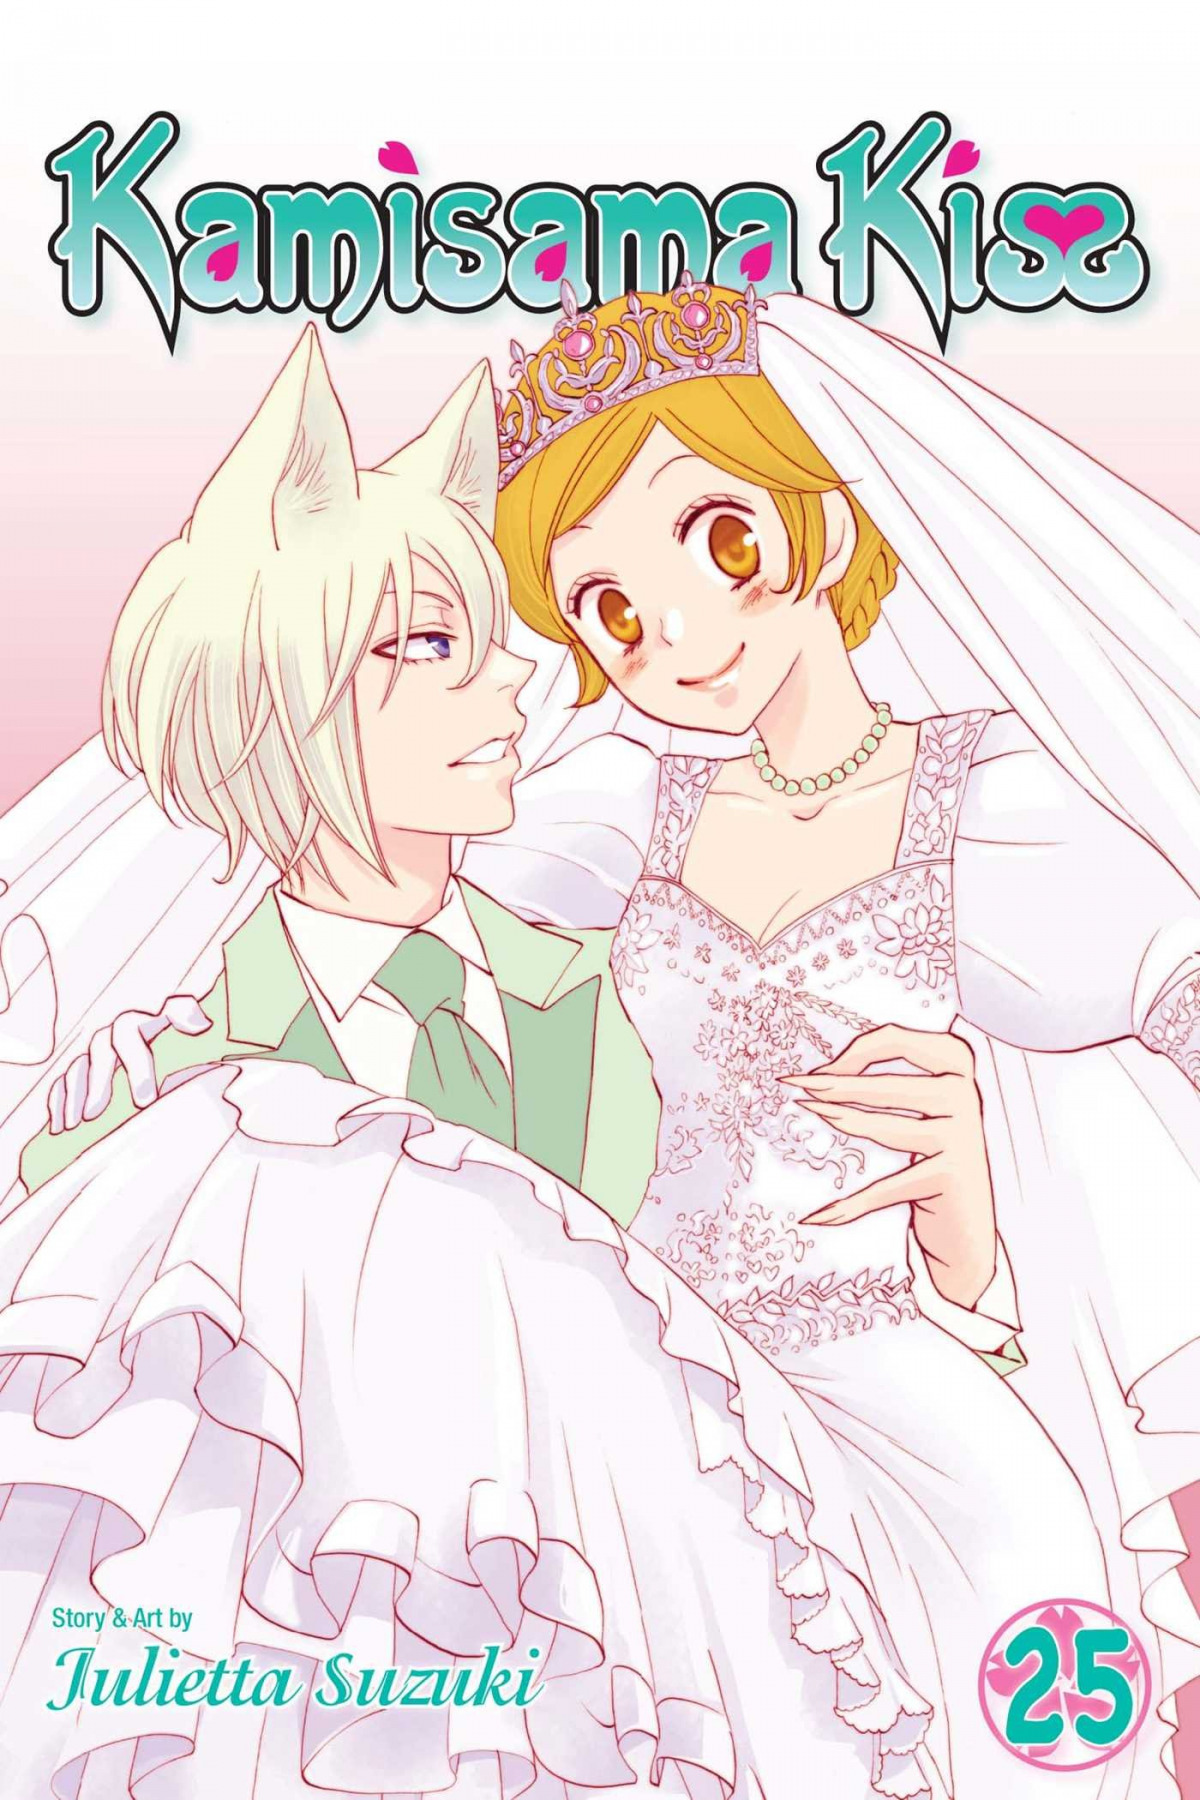 (suzuki).kamisama kiss (simon and sch)